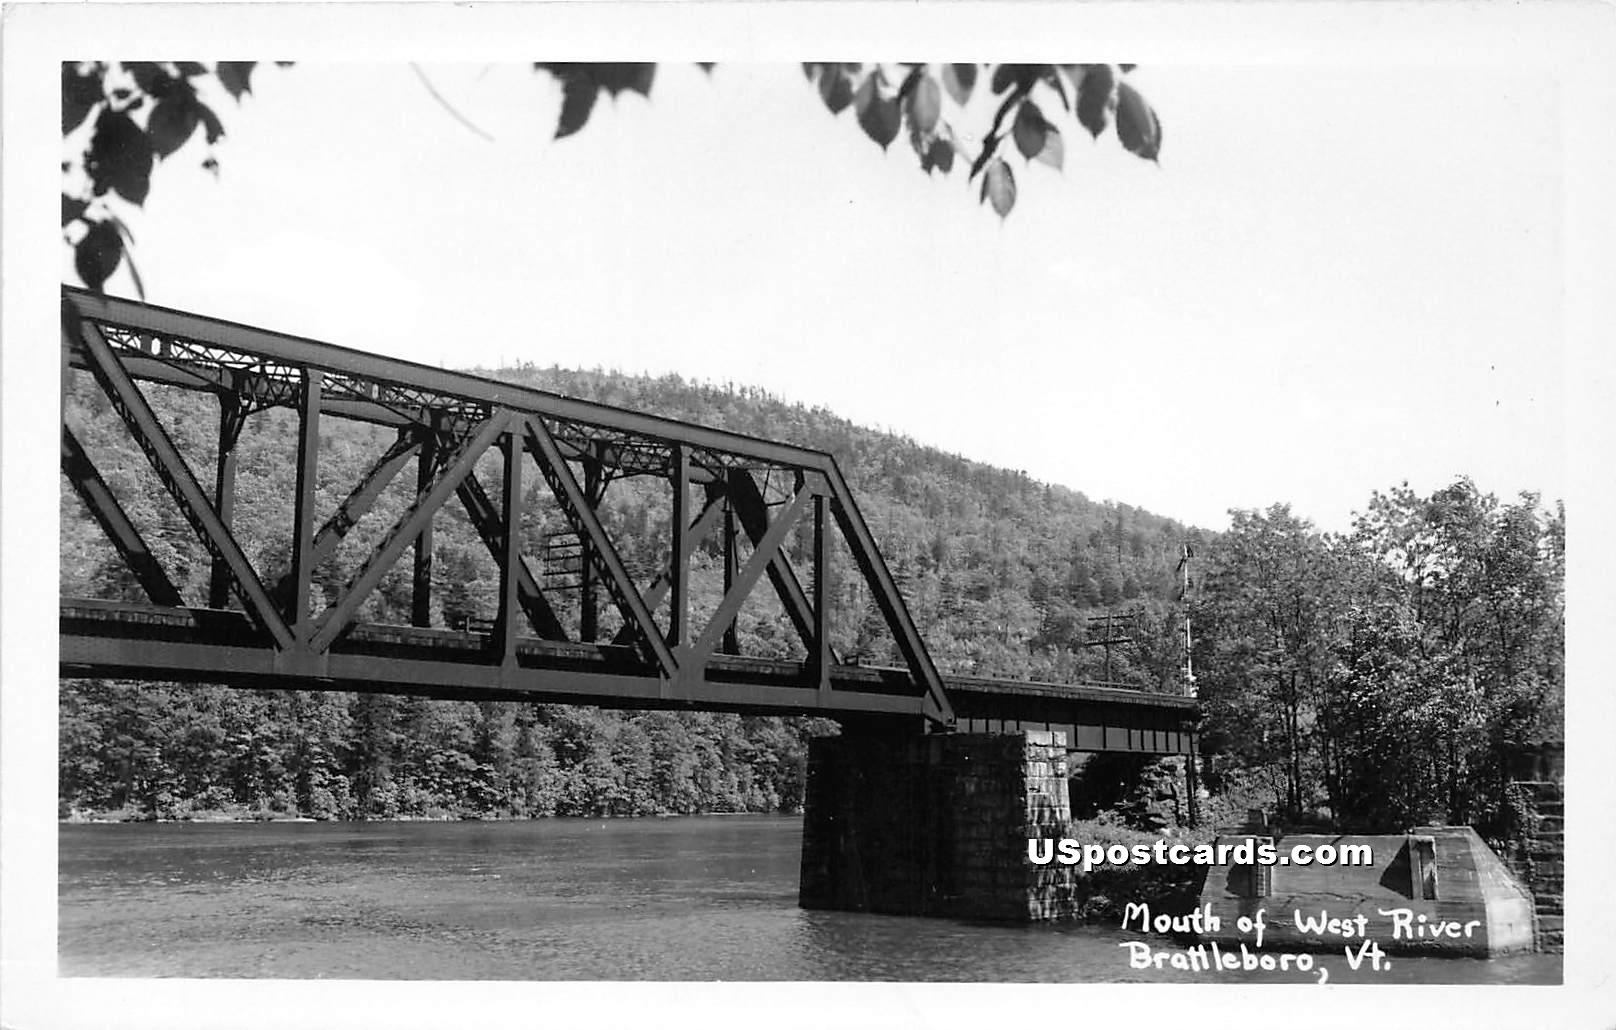 Mouth of West River - Brattleboro, Vermont VT Postcard